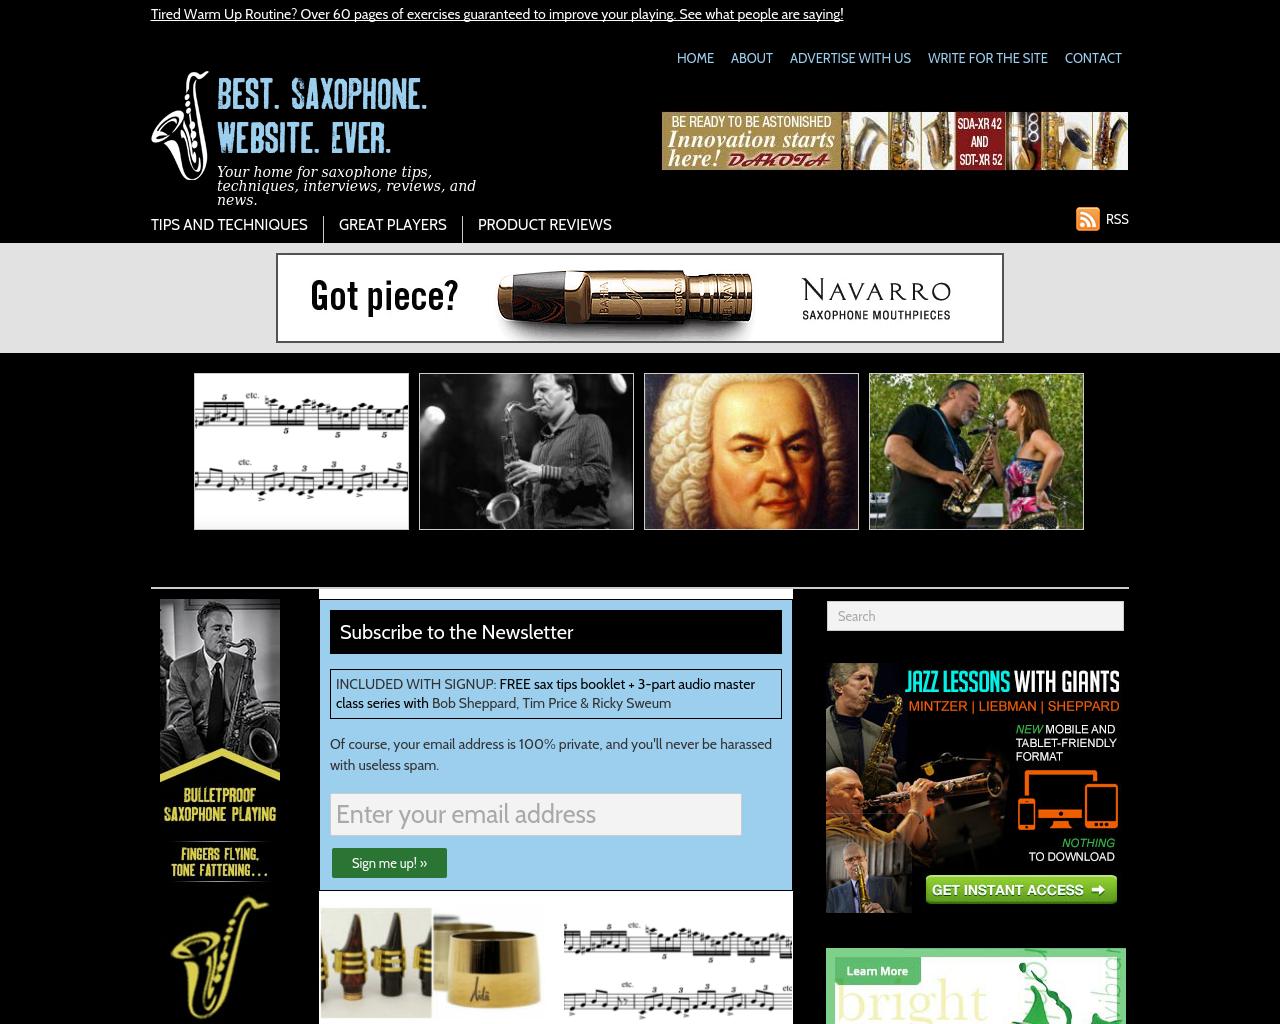 BEST.-SAXOPHONE.-WEBSITE.-EVER-Advertising-Reviews-Pricing